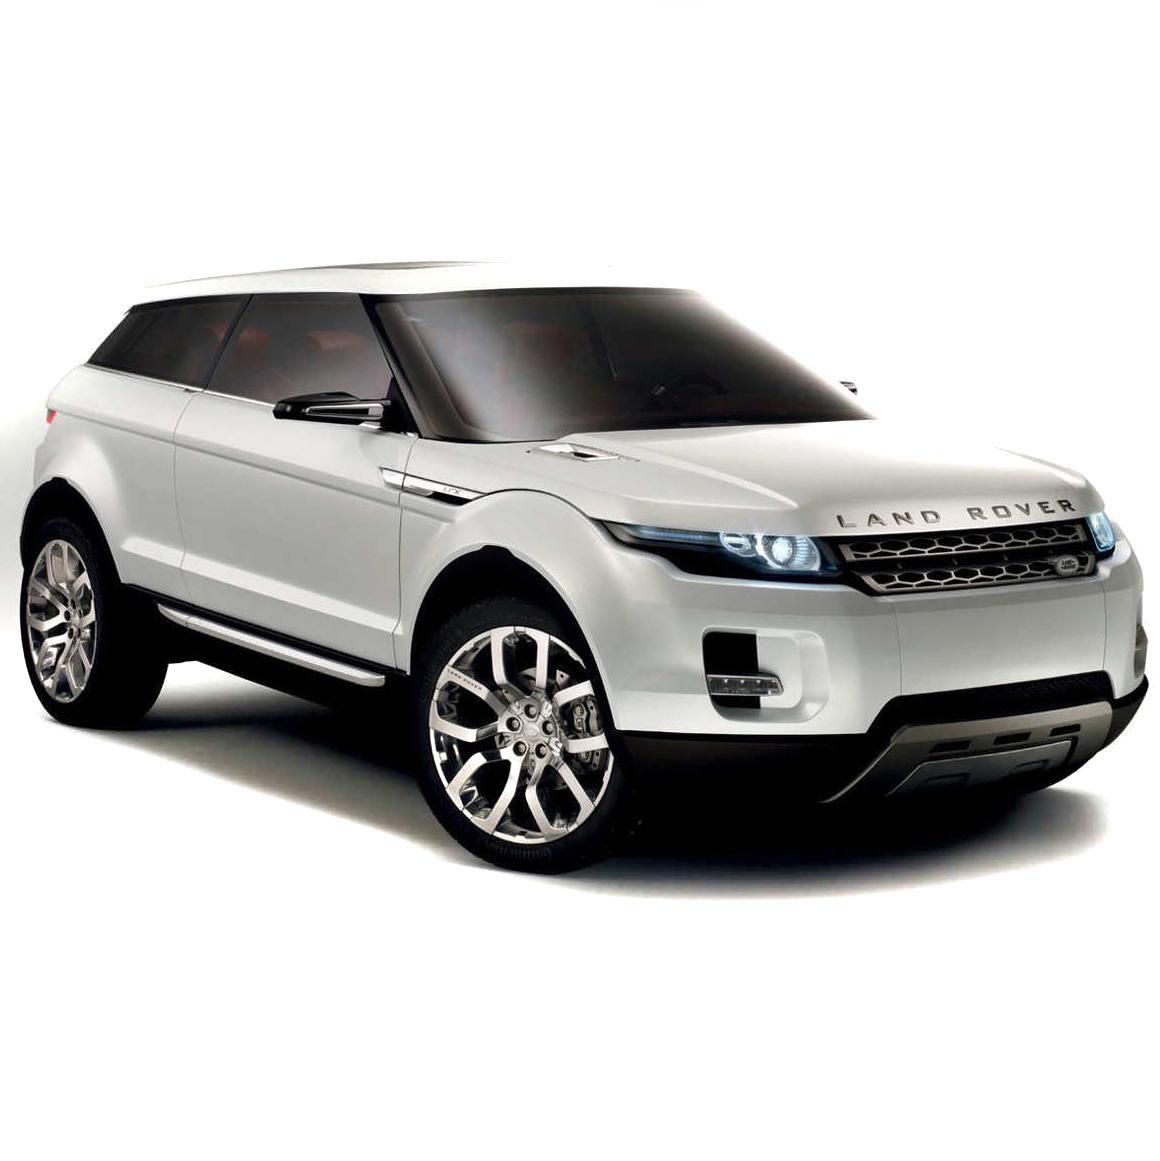 Land Rover Range Rover Evoque (All Models)